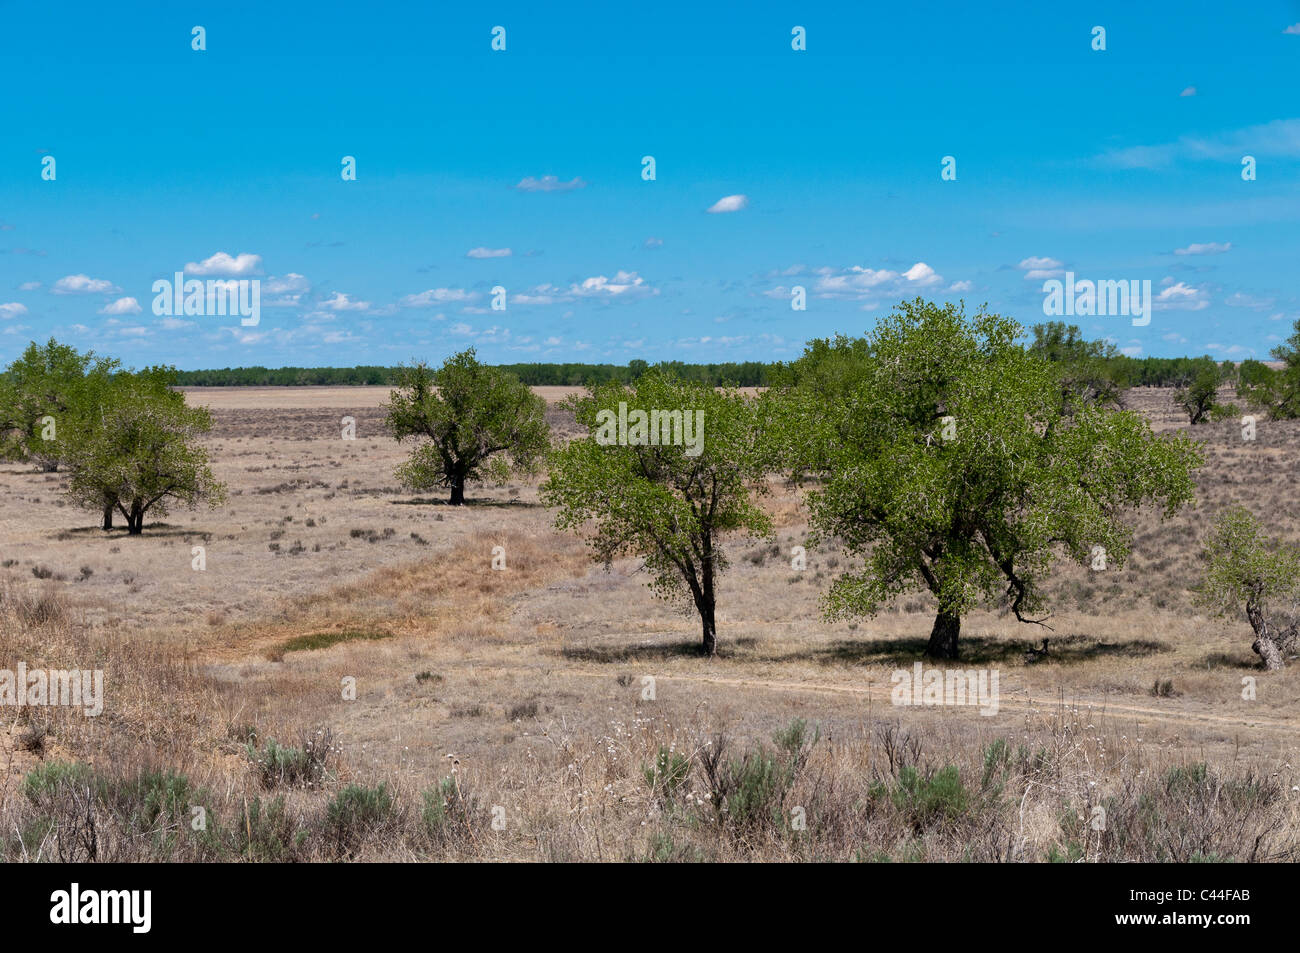 Big Sandy Creek, Sand Creek Massacre National Historic Site, Eads, Colorado. - Stock Image